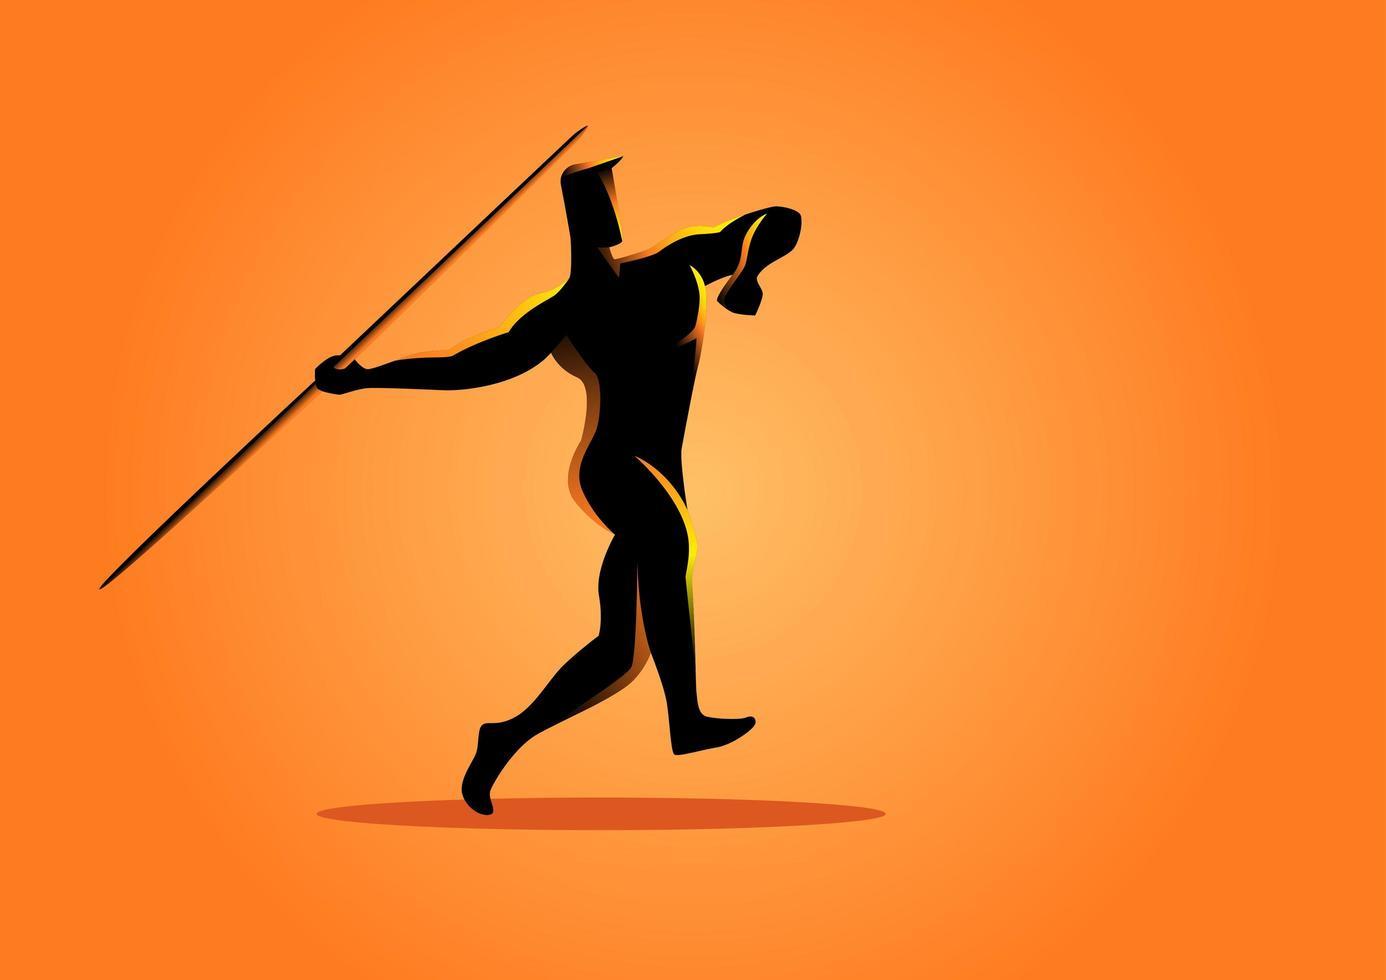 Sport Silhouette Javelin Thrower vector